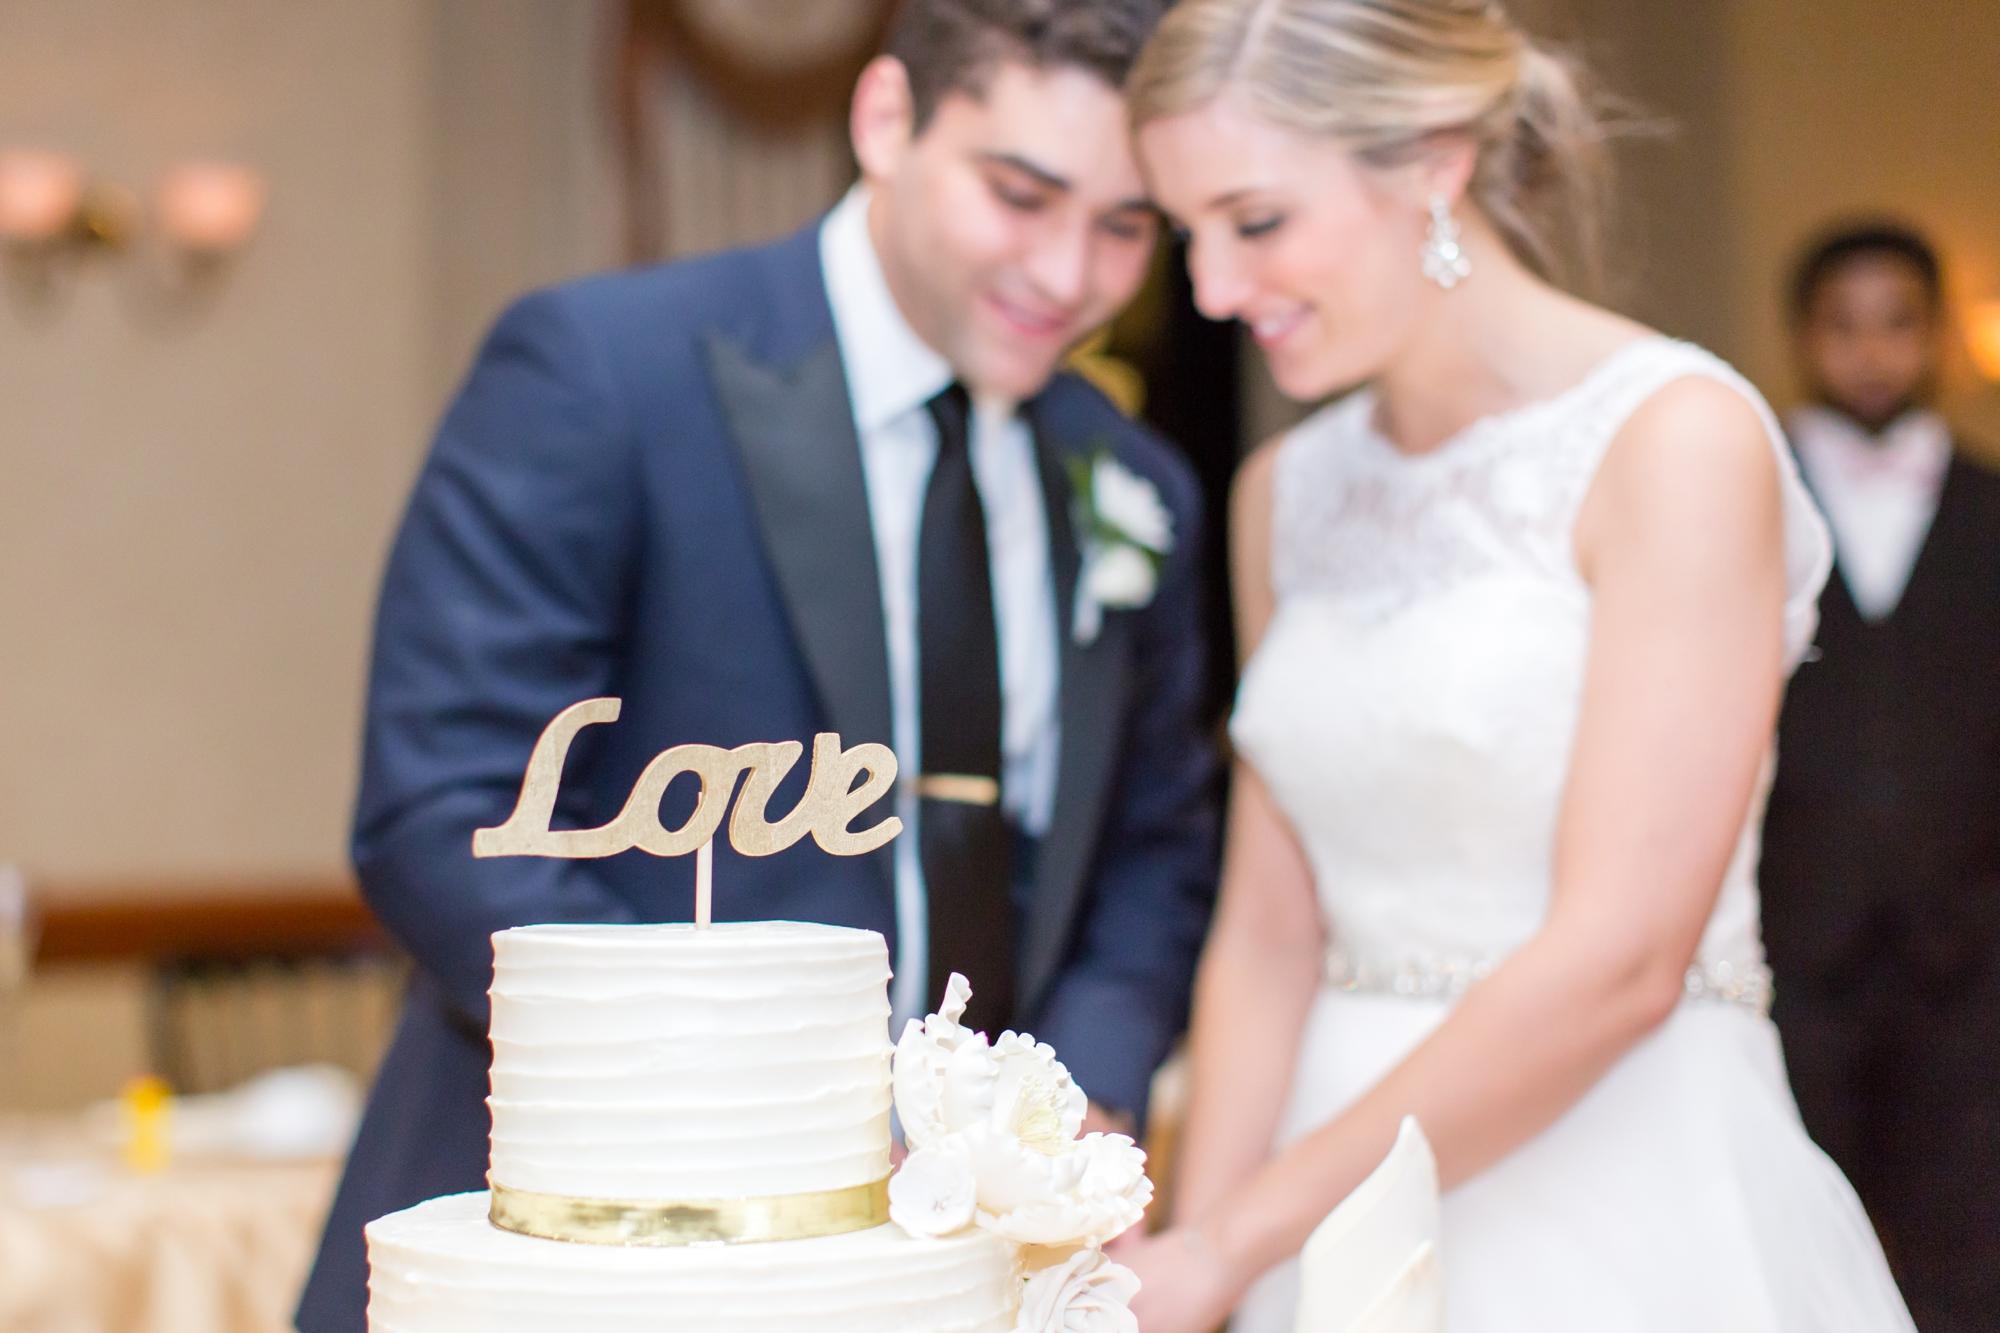 6-Finkel Wedding Reception-951_anna grace photography maryland wedding photographer turf valley.jpg